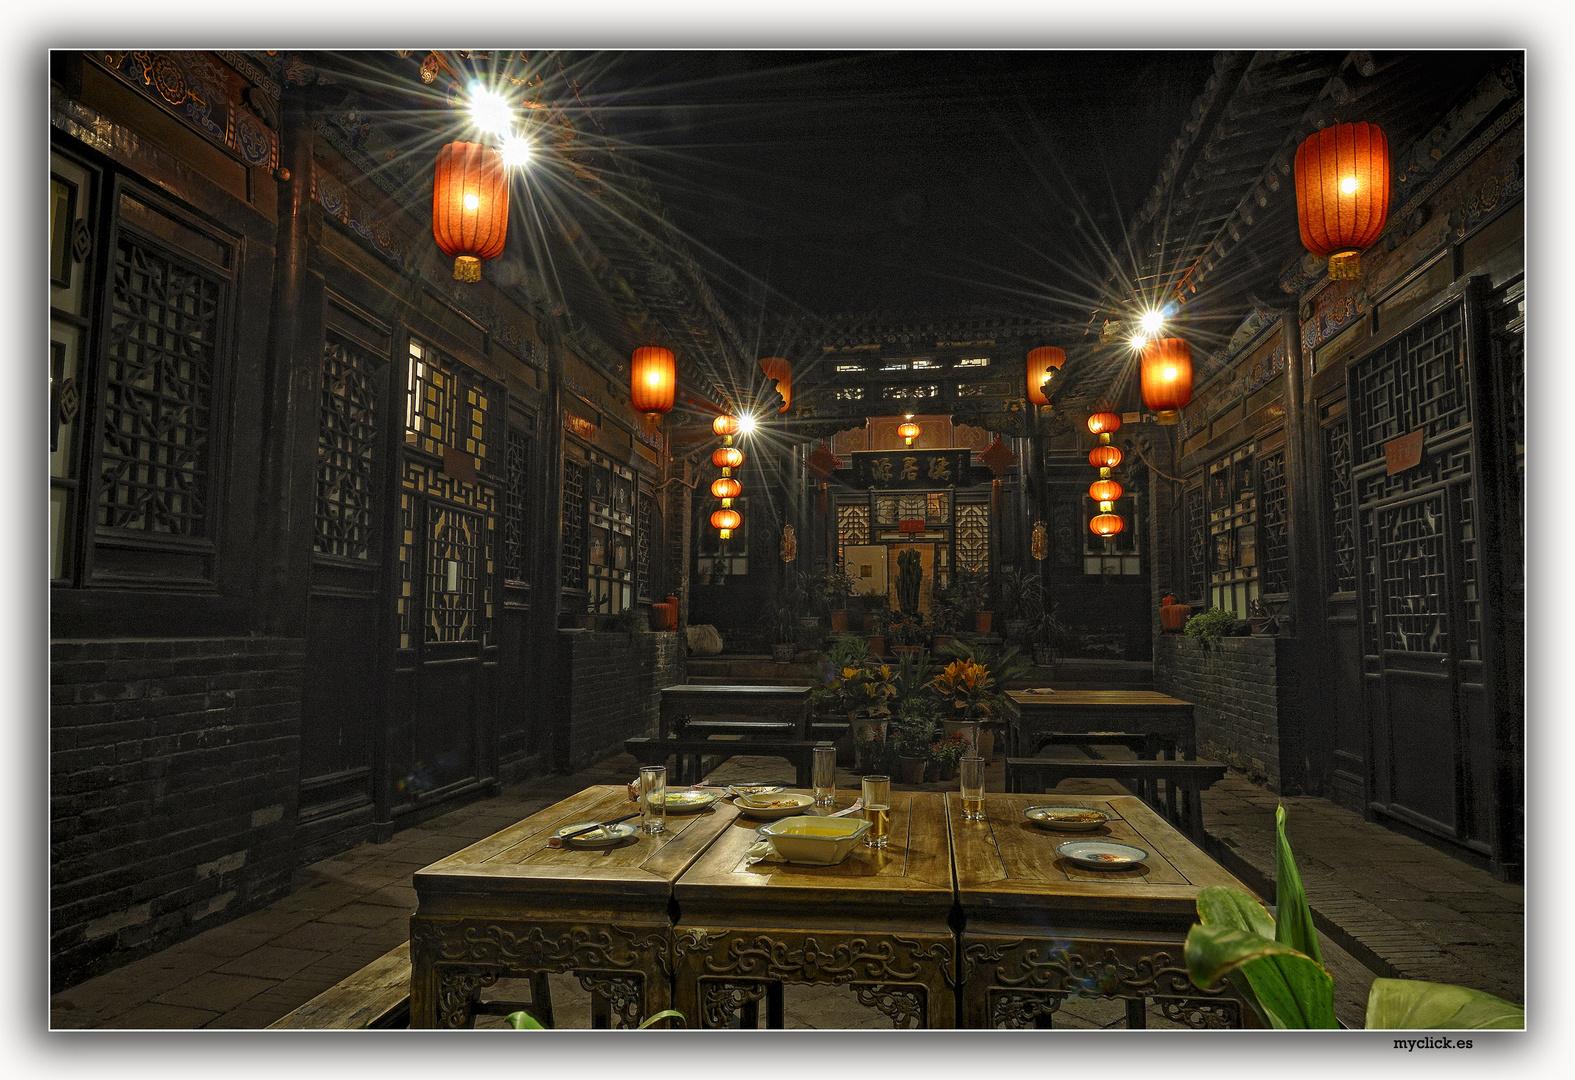 EN LA RUTA DE LA SEDA-UN HOTELITO MUY CHINO-PINGYAO-CHINA